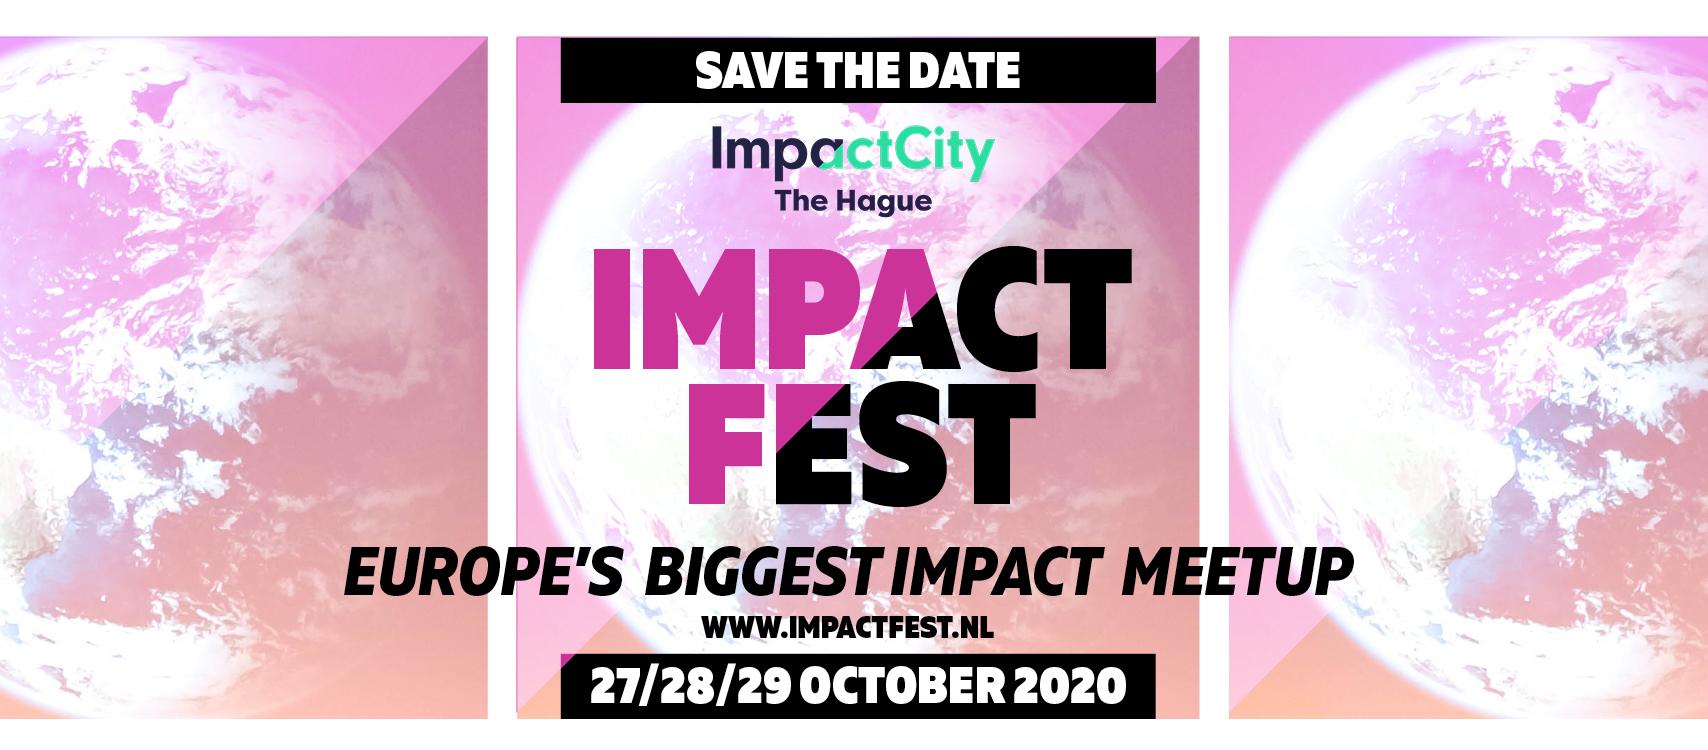 Impact Fest 2020, The Hague, The Netherlands